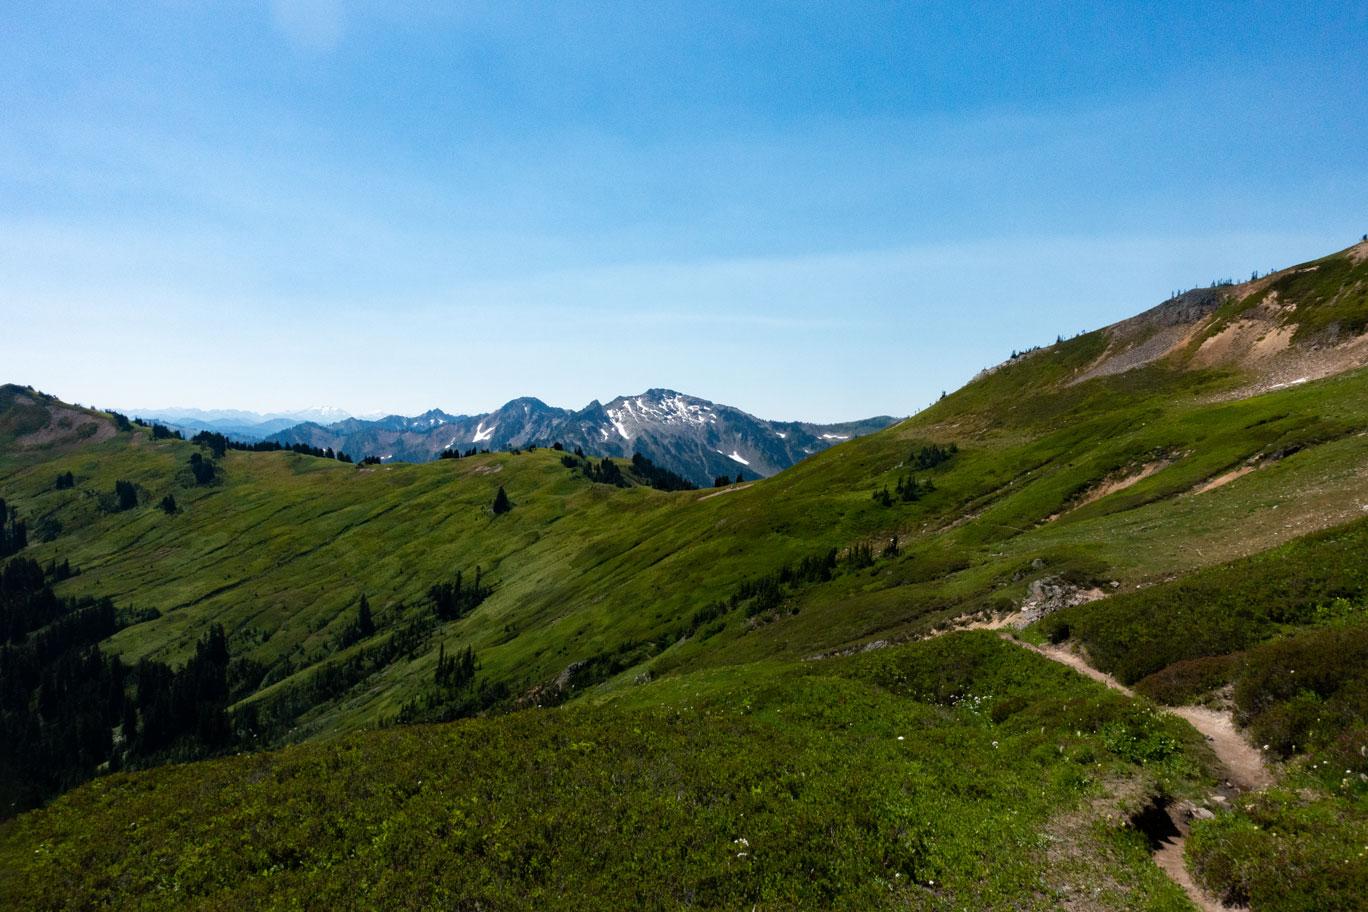 C:\Users\Russ\Desktop\Aug 2017 Glacier Peak with Pavel\JPG SEL\WEB\DSC01351.jpg